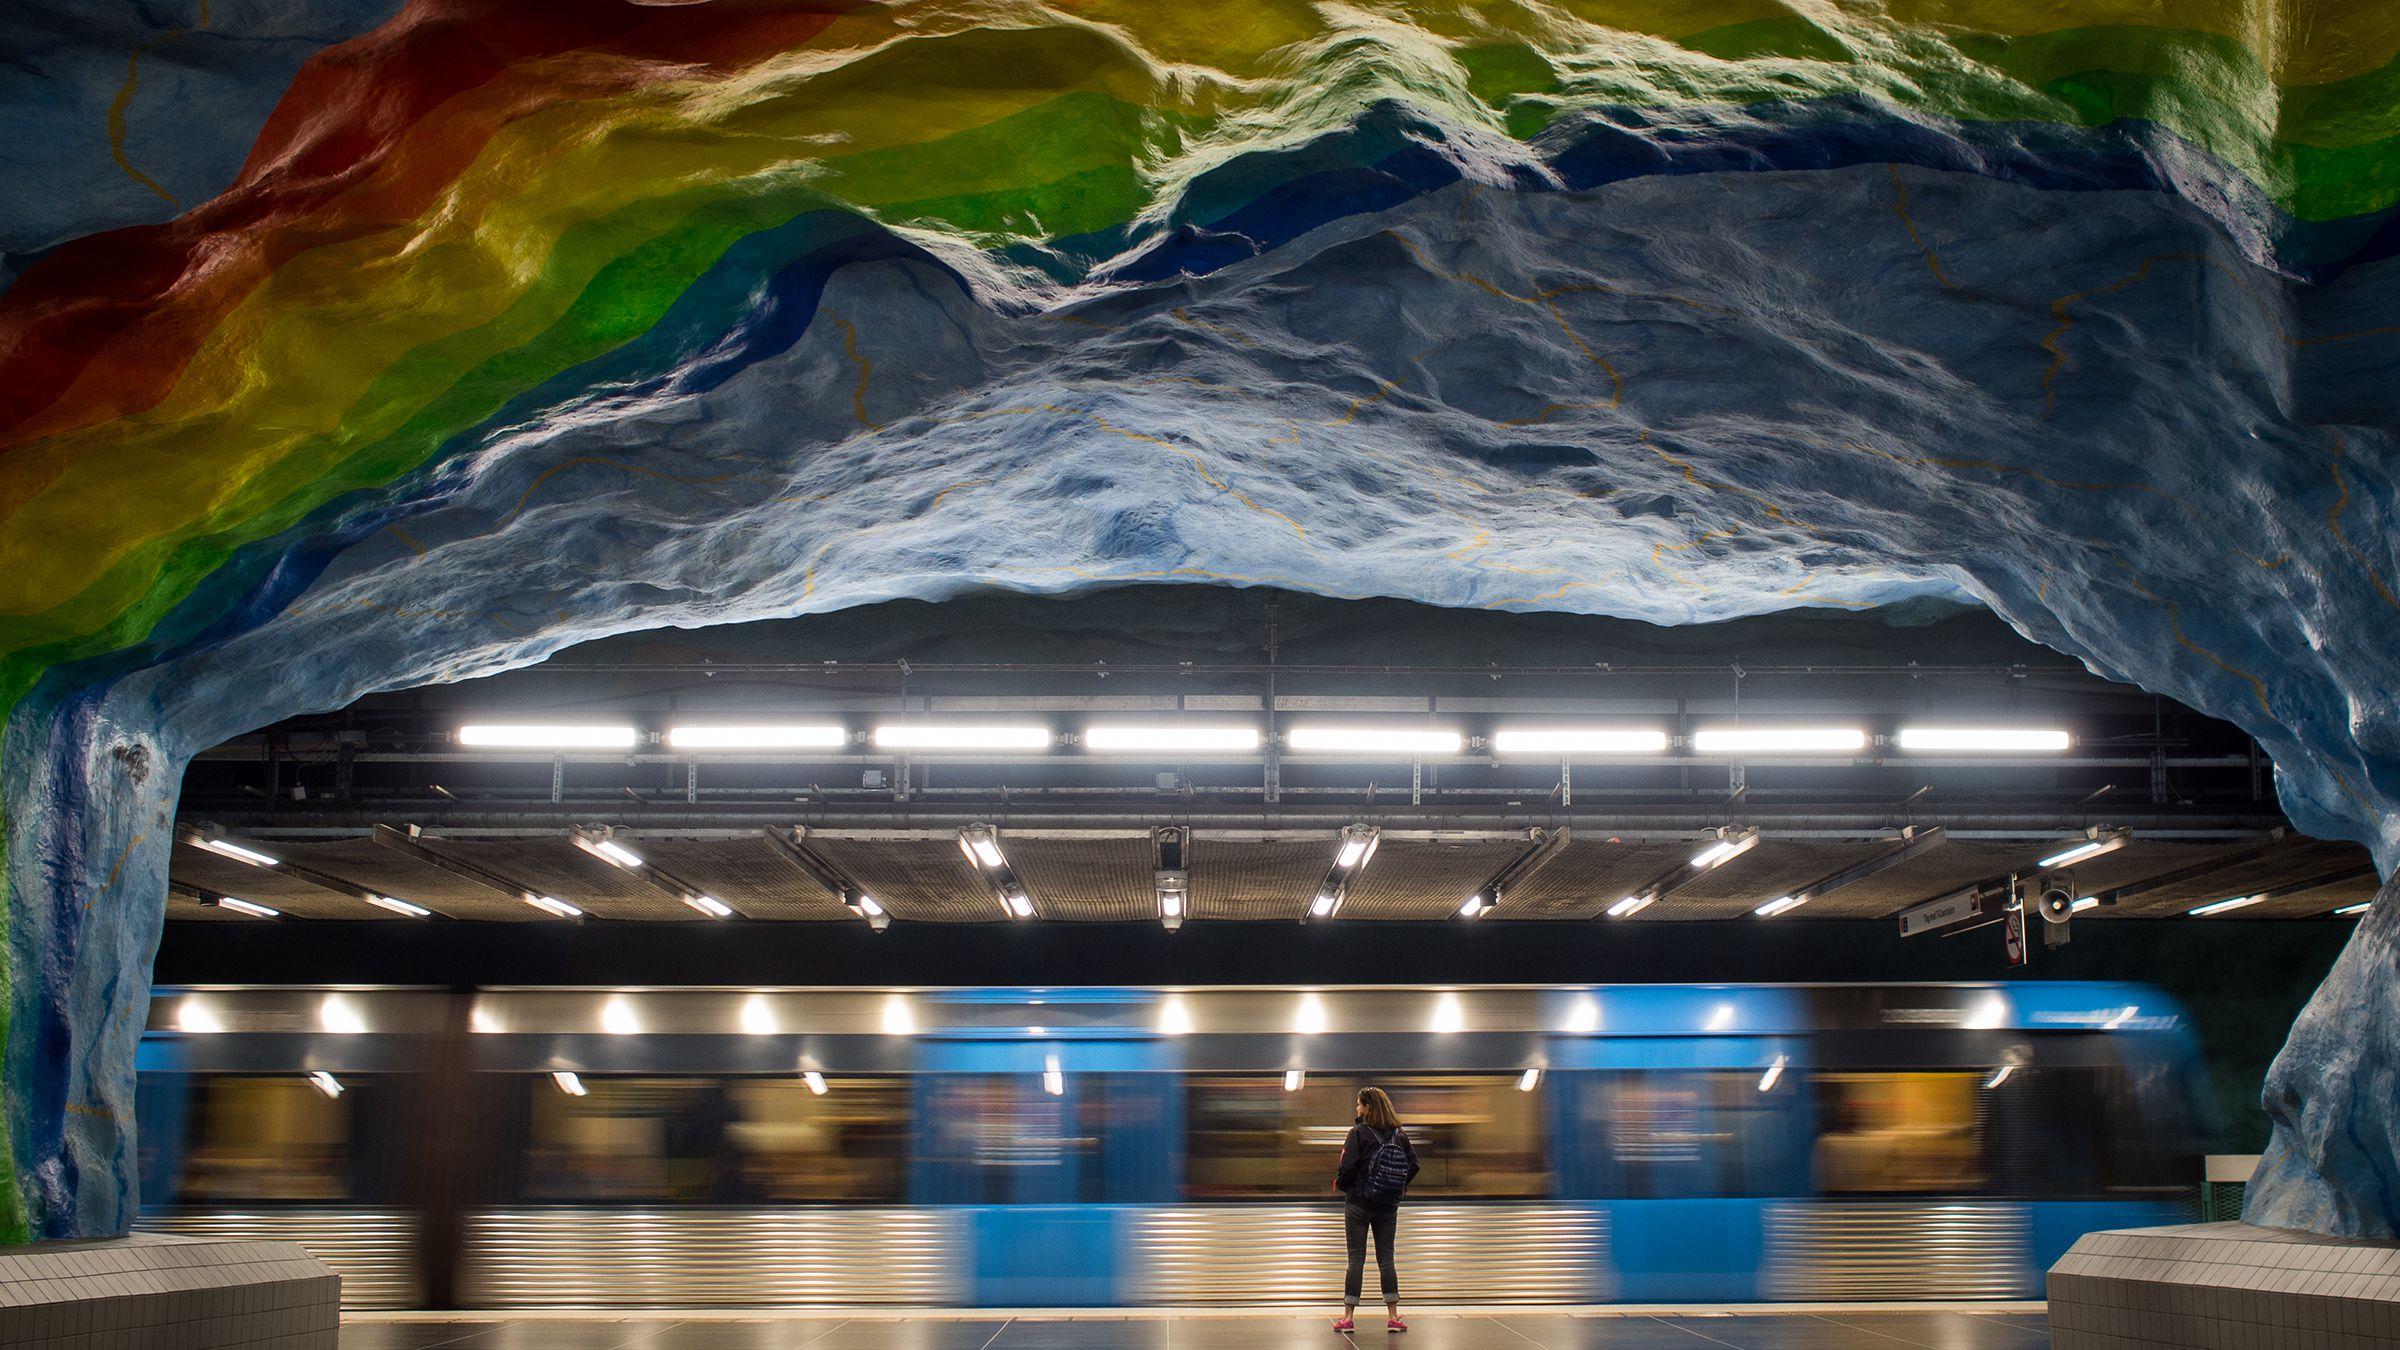 Stockholm's Stadion metro station